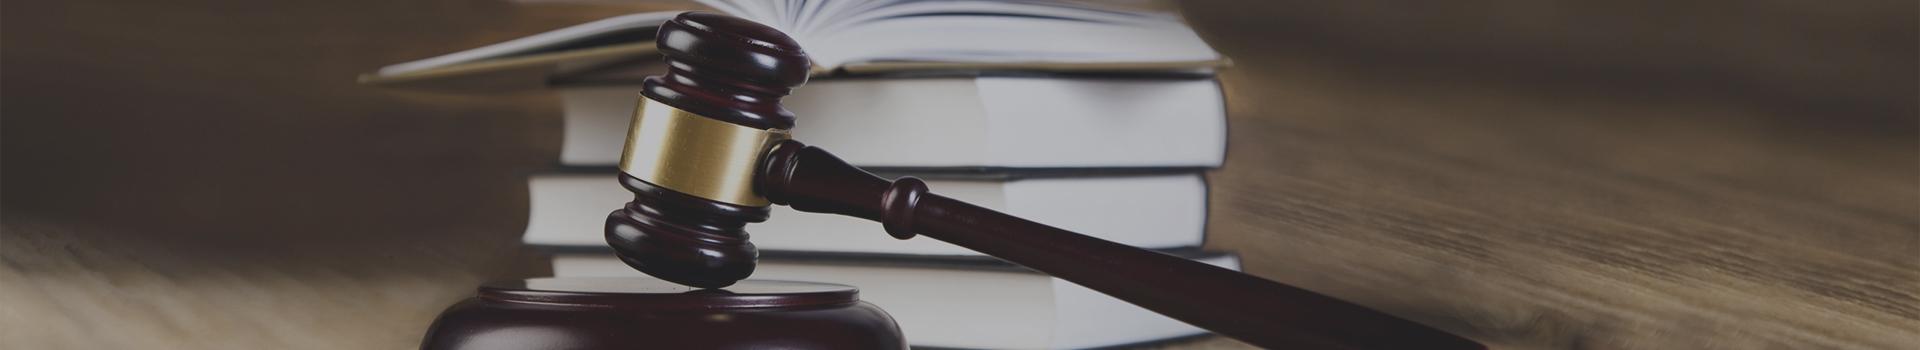 法律法规bannar